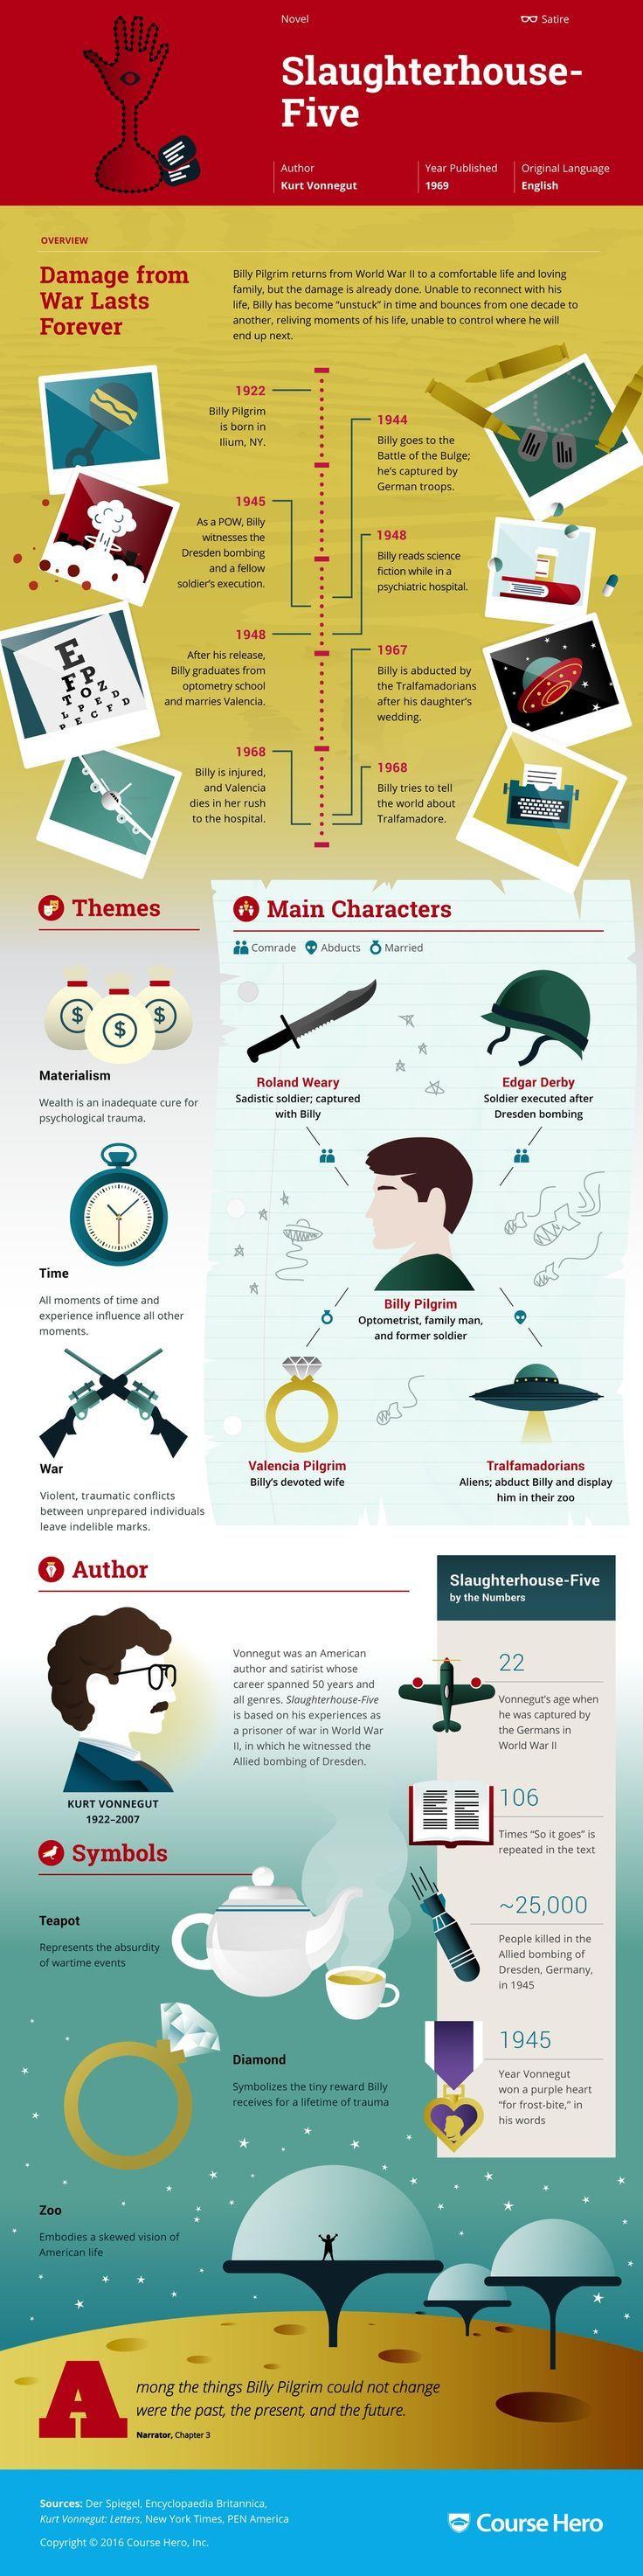 Slaughterhouse Five Infographic | Course Hero